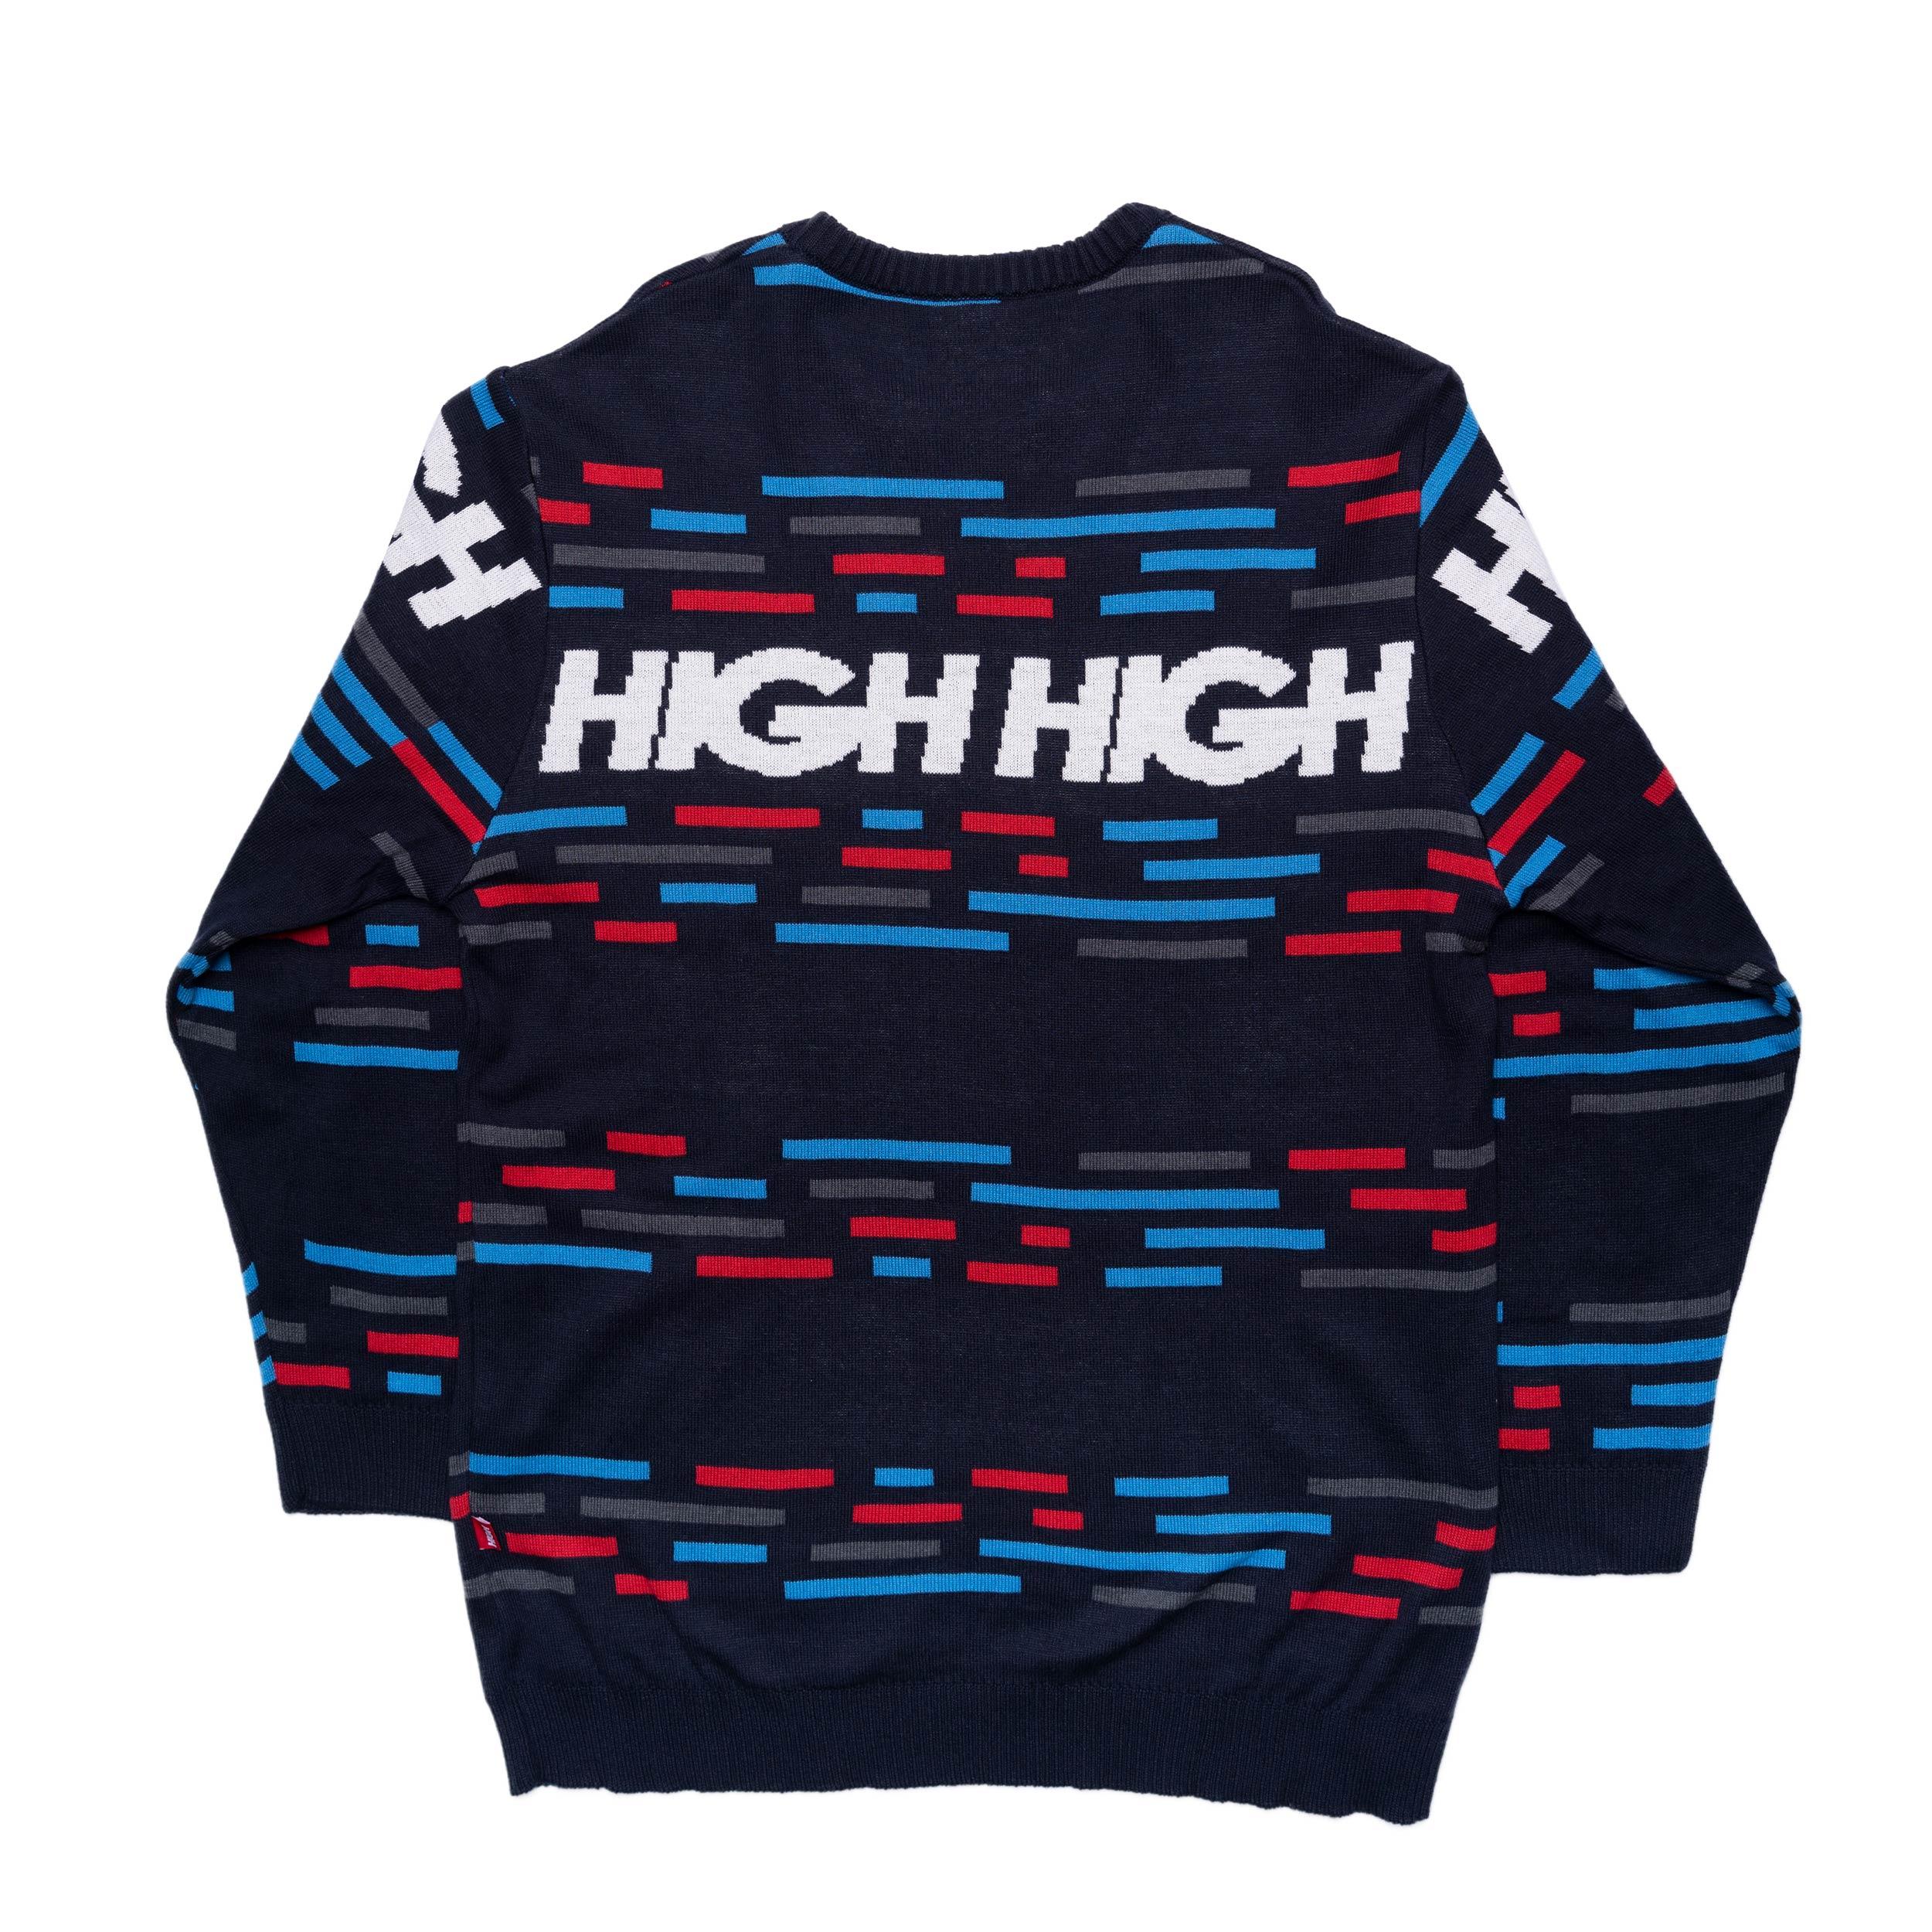 Knitwear_RGB_Navy